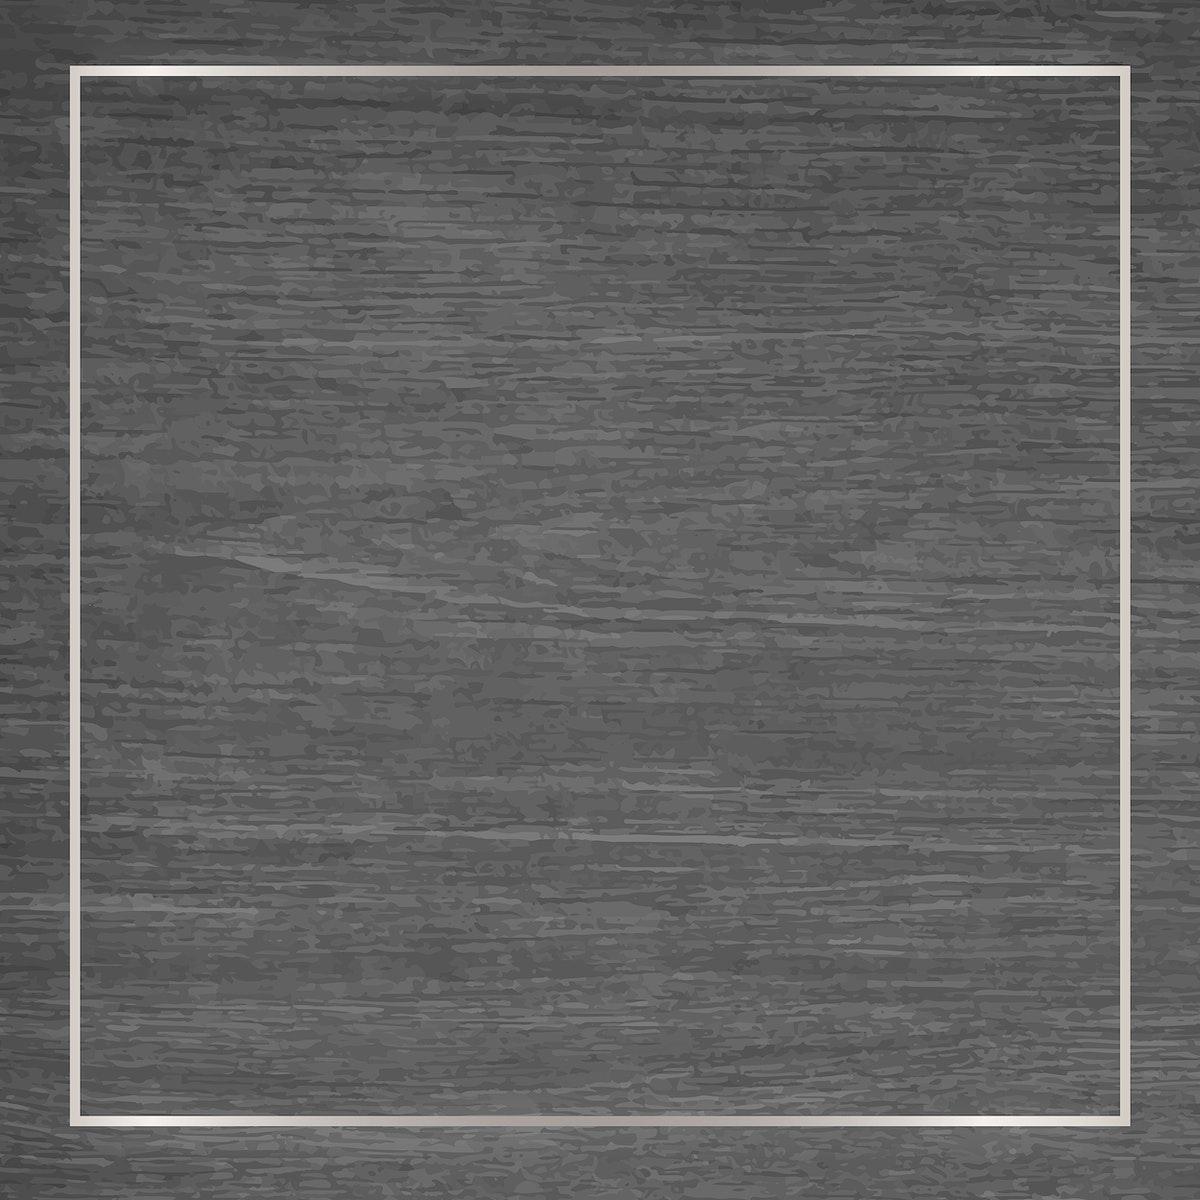 White gold frame on gray wooden background vector